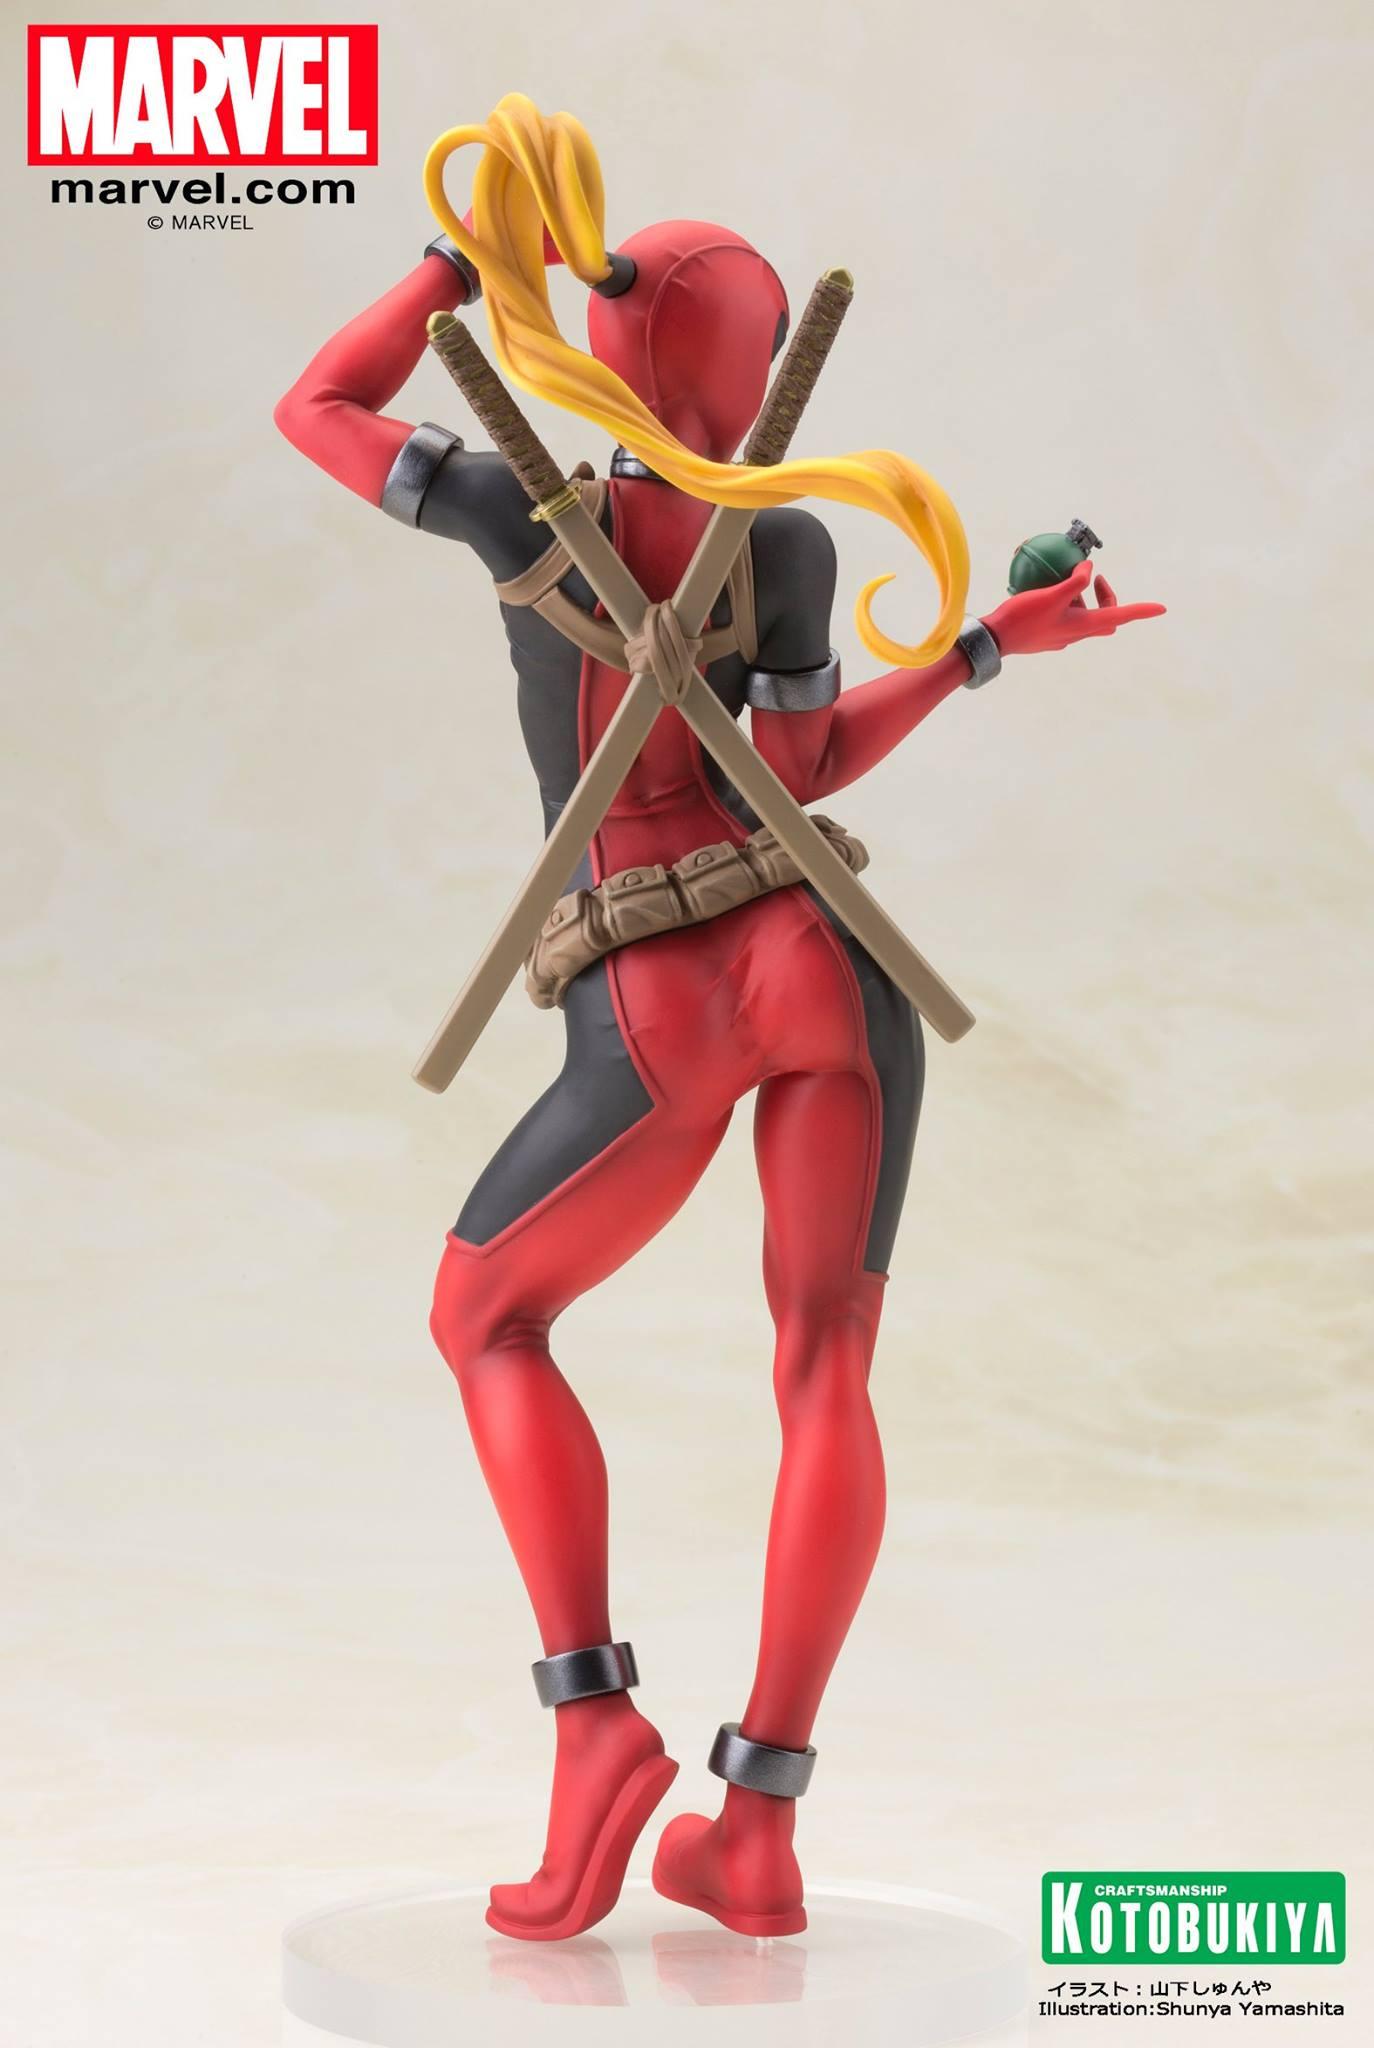 lady-deadpool-bishoujo-statue-marvel-kotobukiya-4